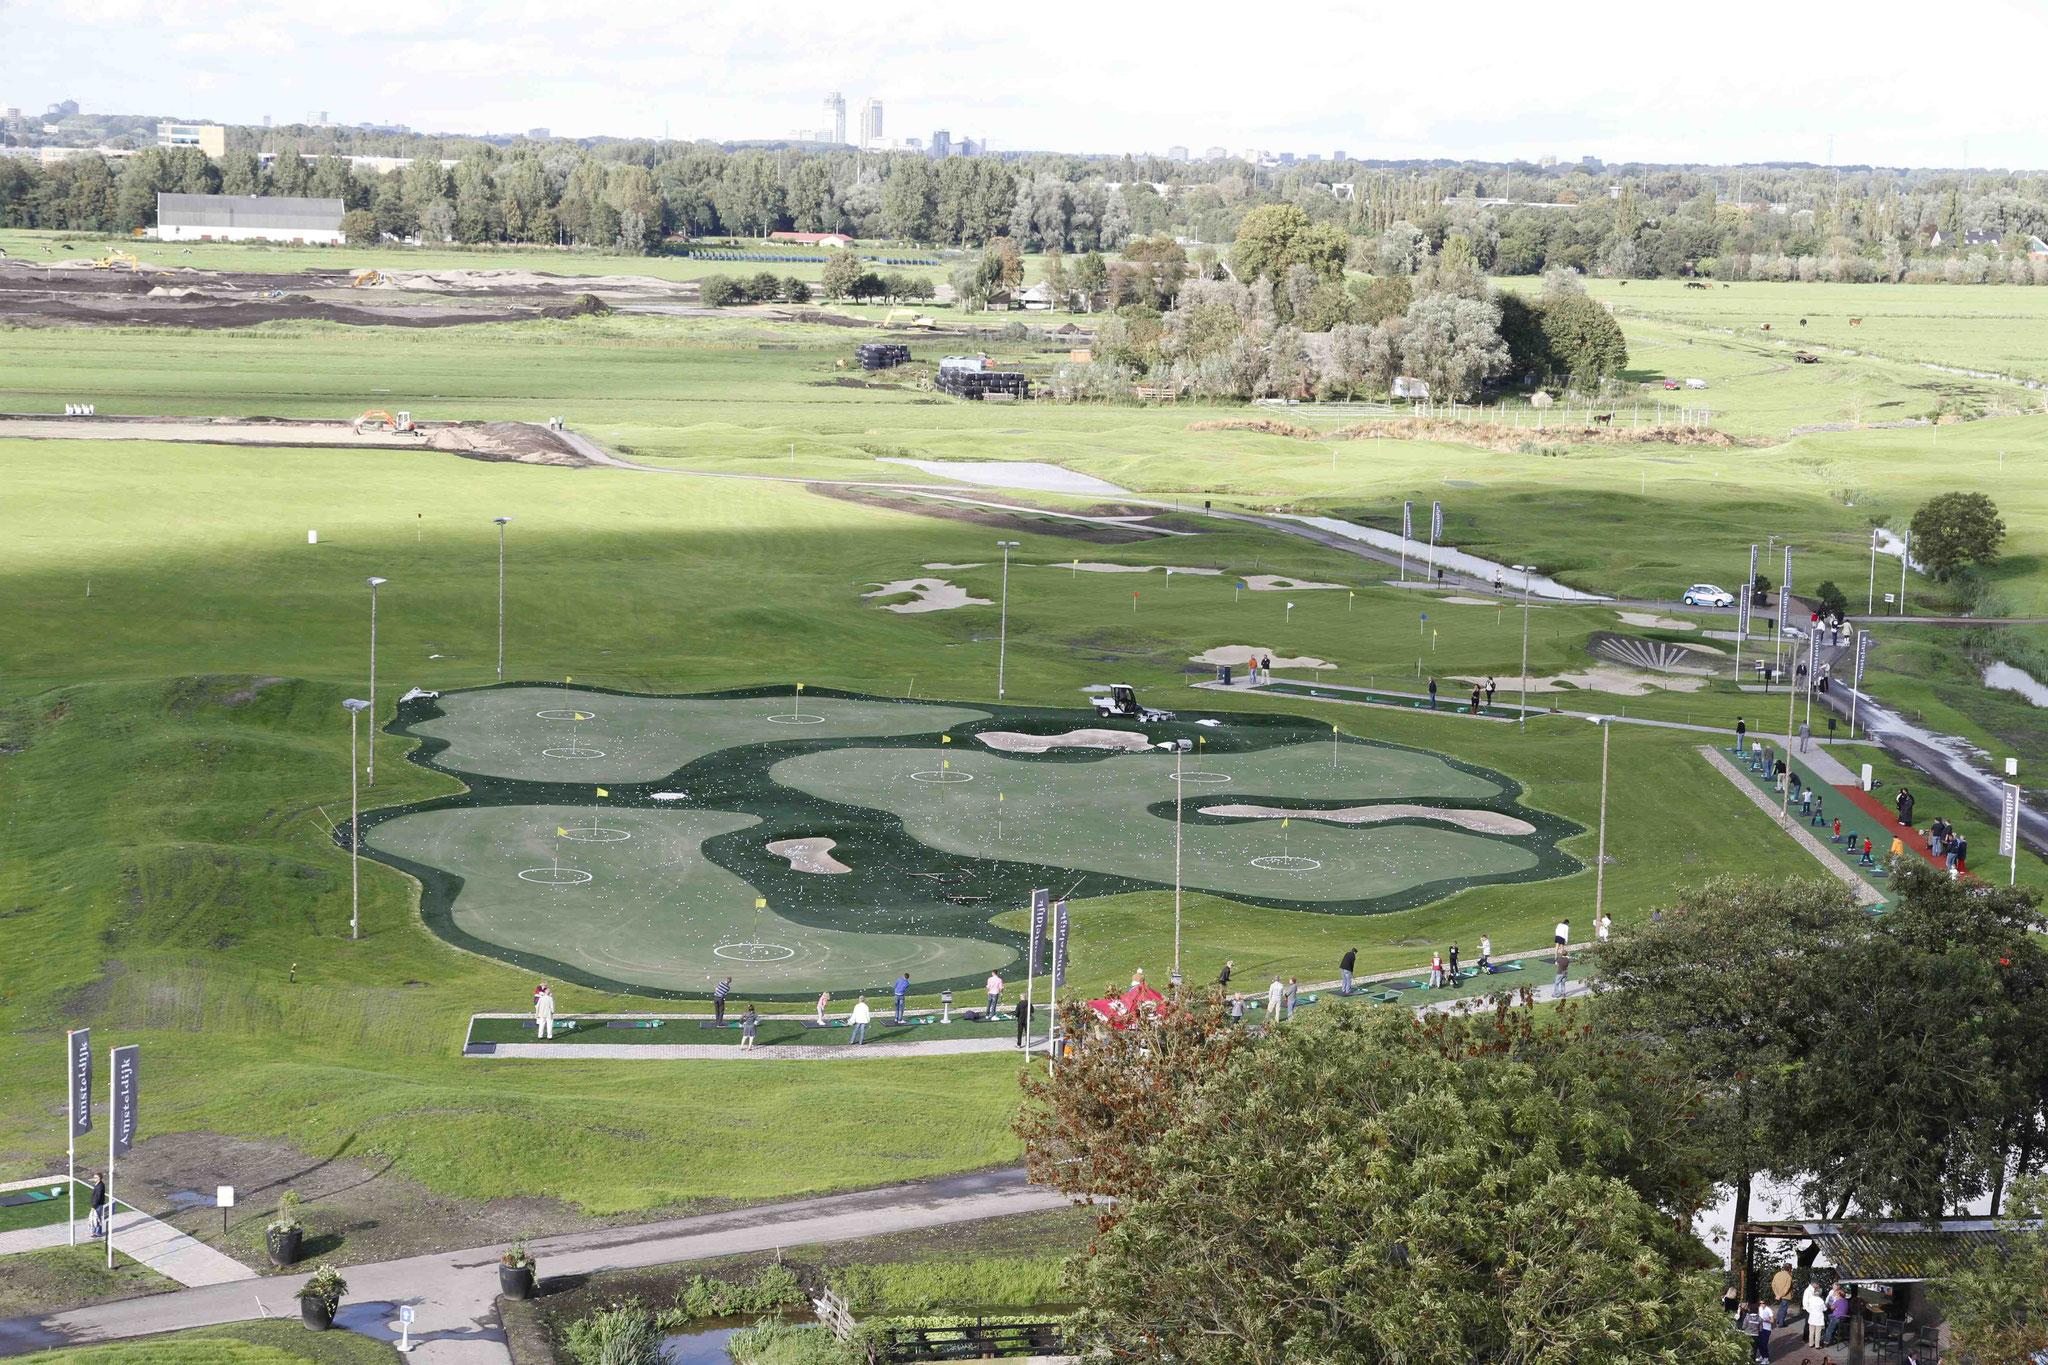 Golf World Amstldijk / NL